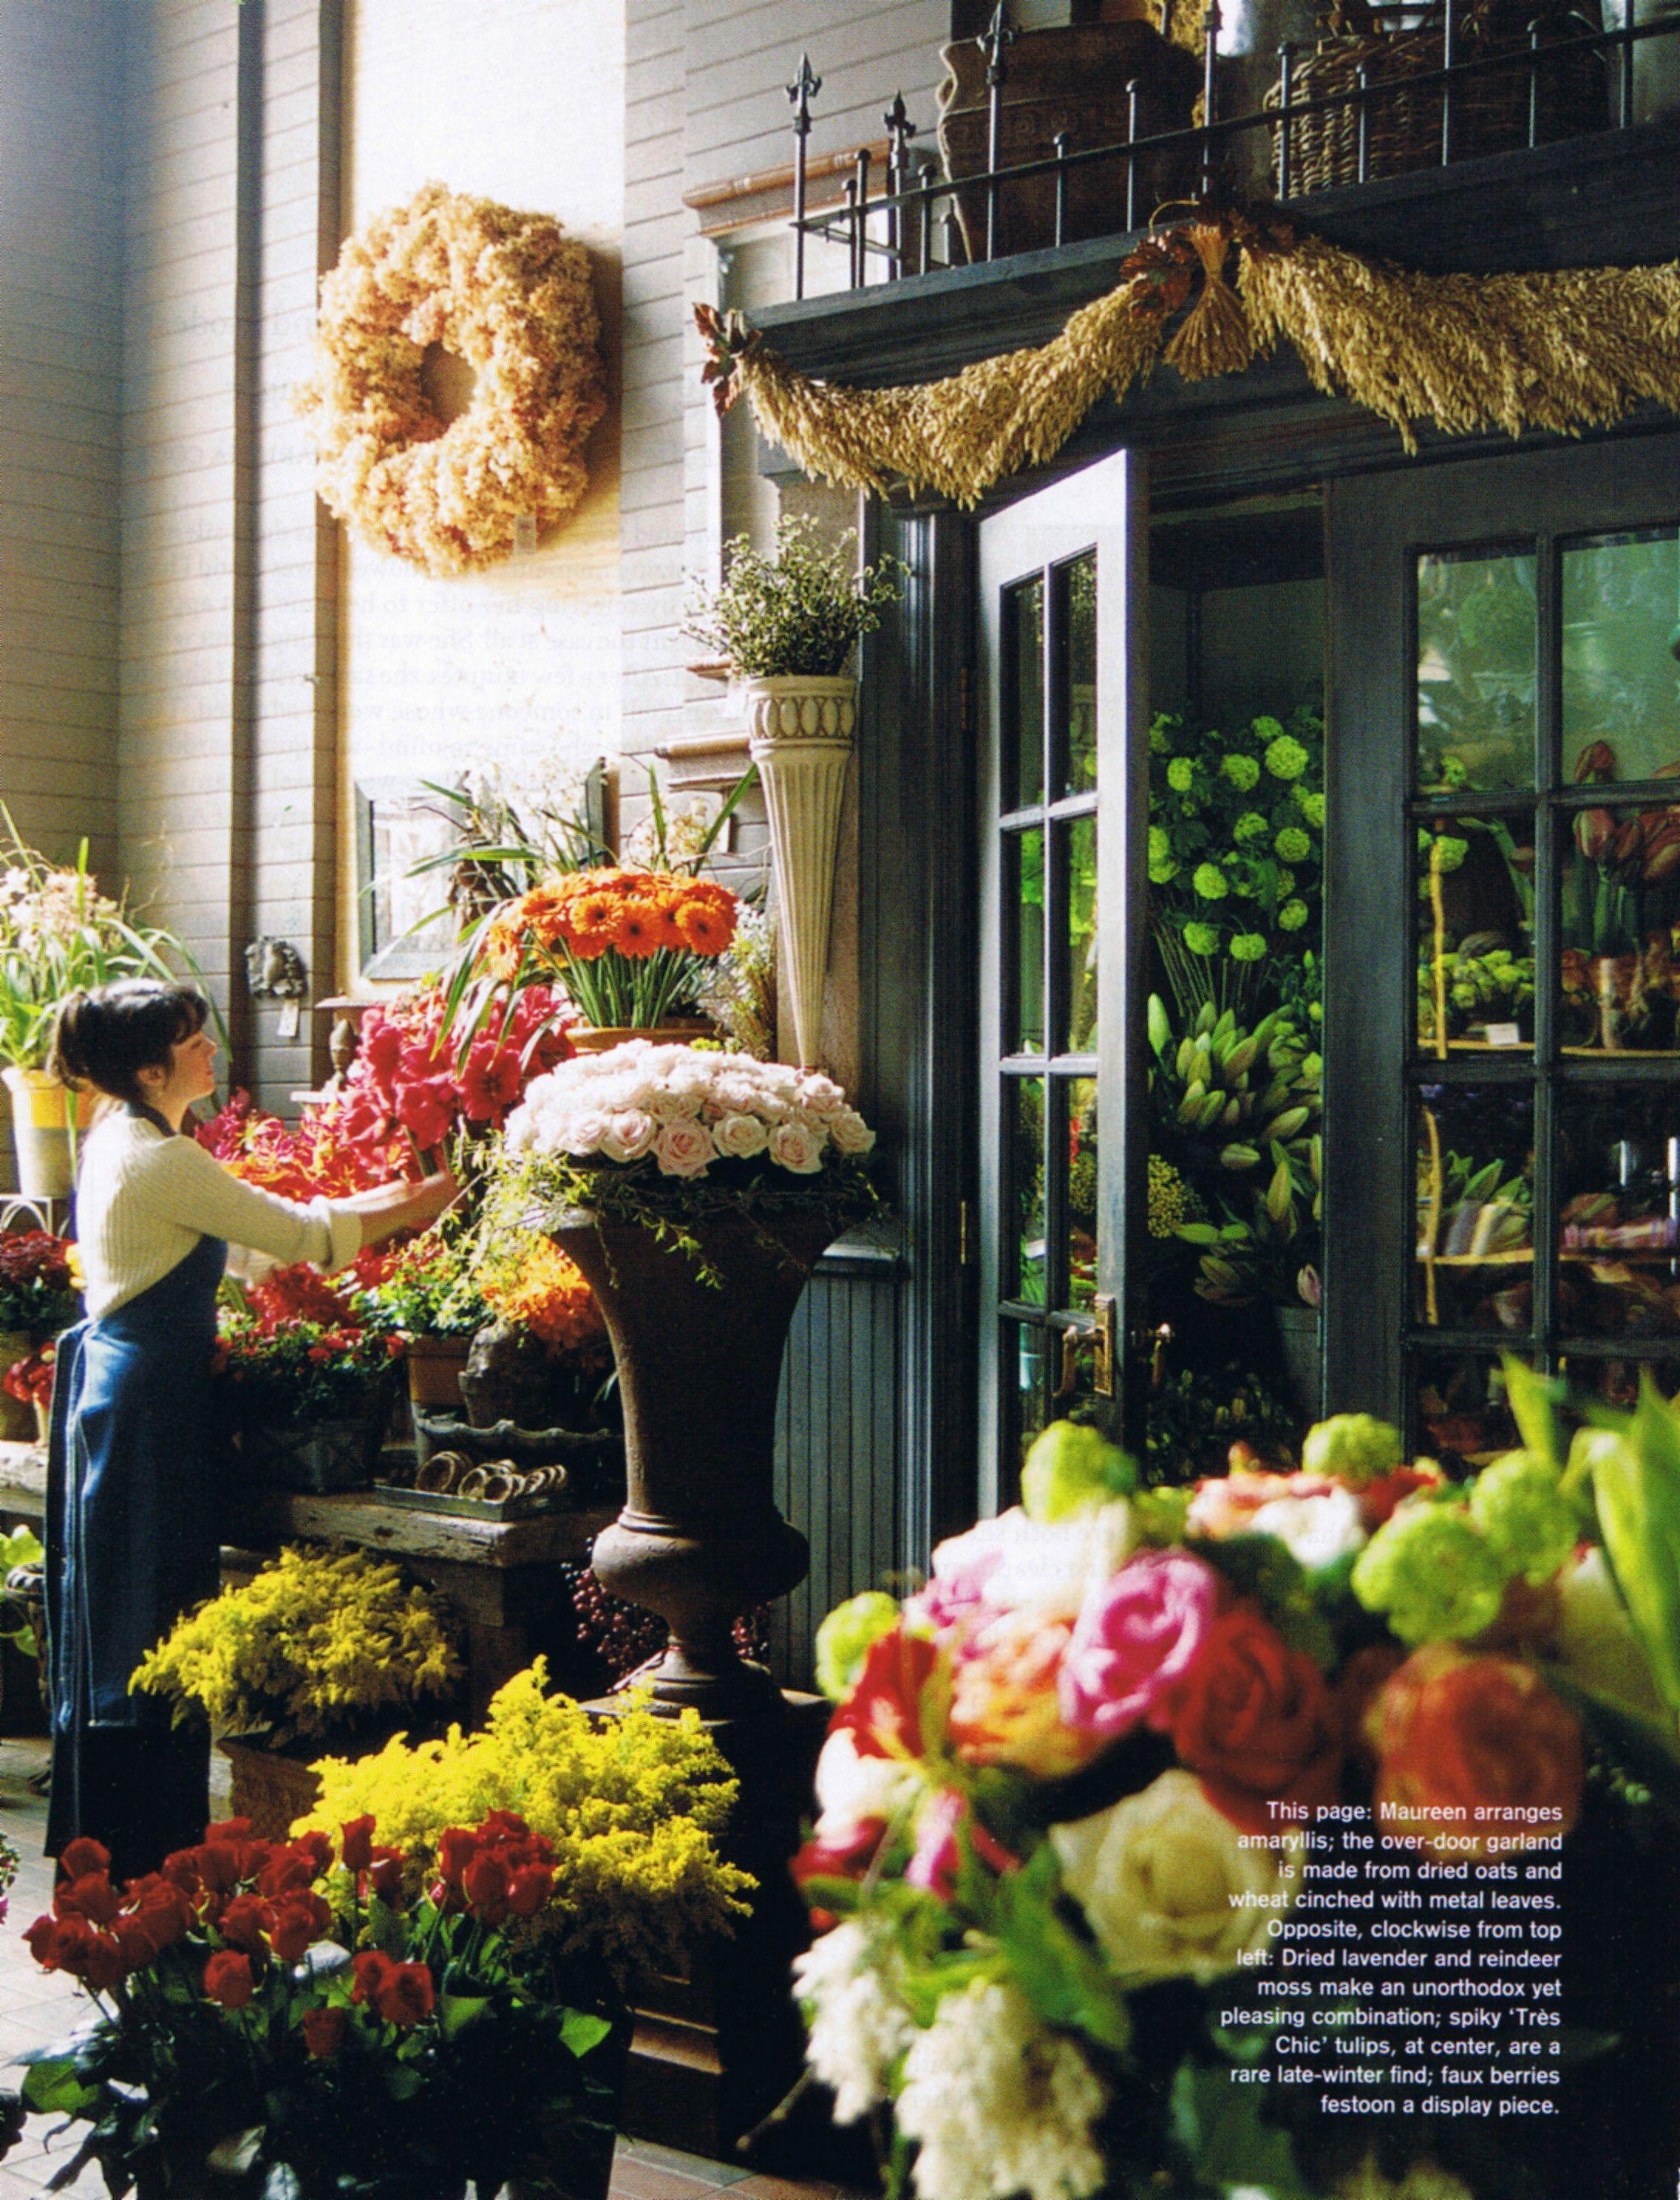 Maureen sullivan of thomas hobbs florist vancouver bc buds maureen sullivan of thomas hobbs florist vancouver bc izmirmasajfo